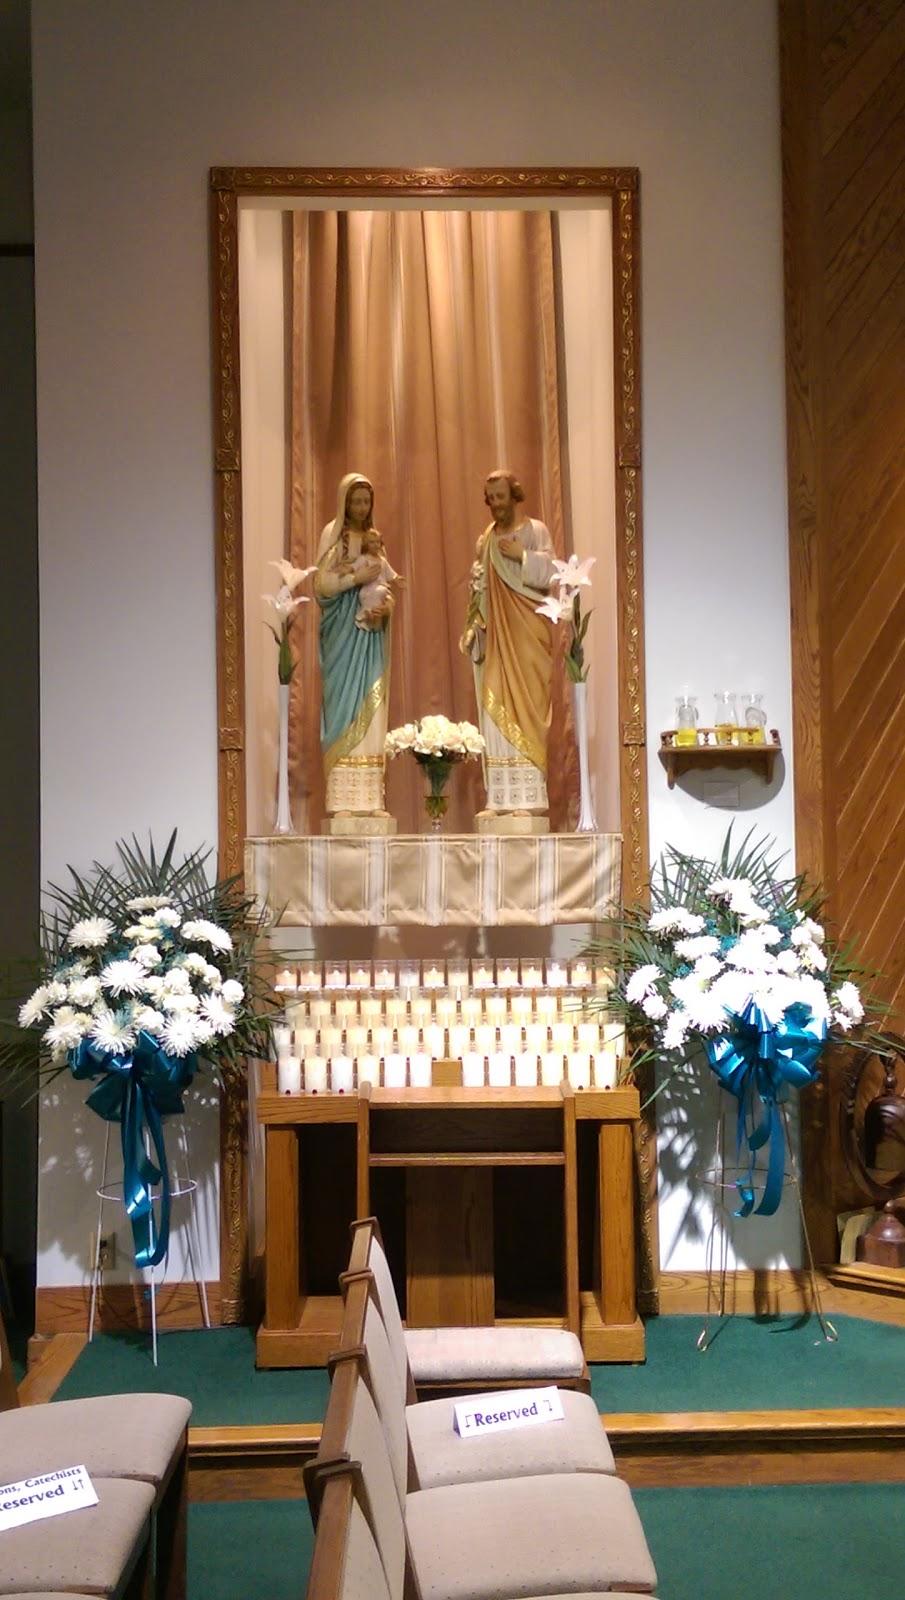 Saint Gregory Barbarigo Catholic Church - church    Photo 5 of 6   Address: 21 Cinder Rd, Garnerville, NY 10923, USA   Phone: (845) 947-1873